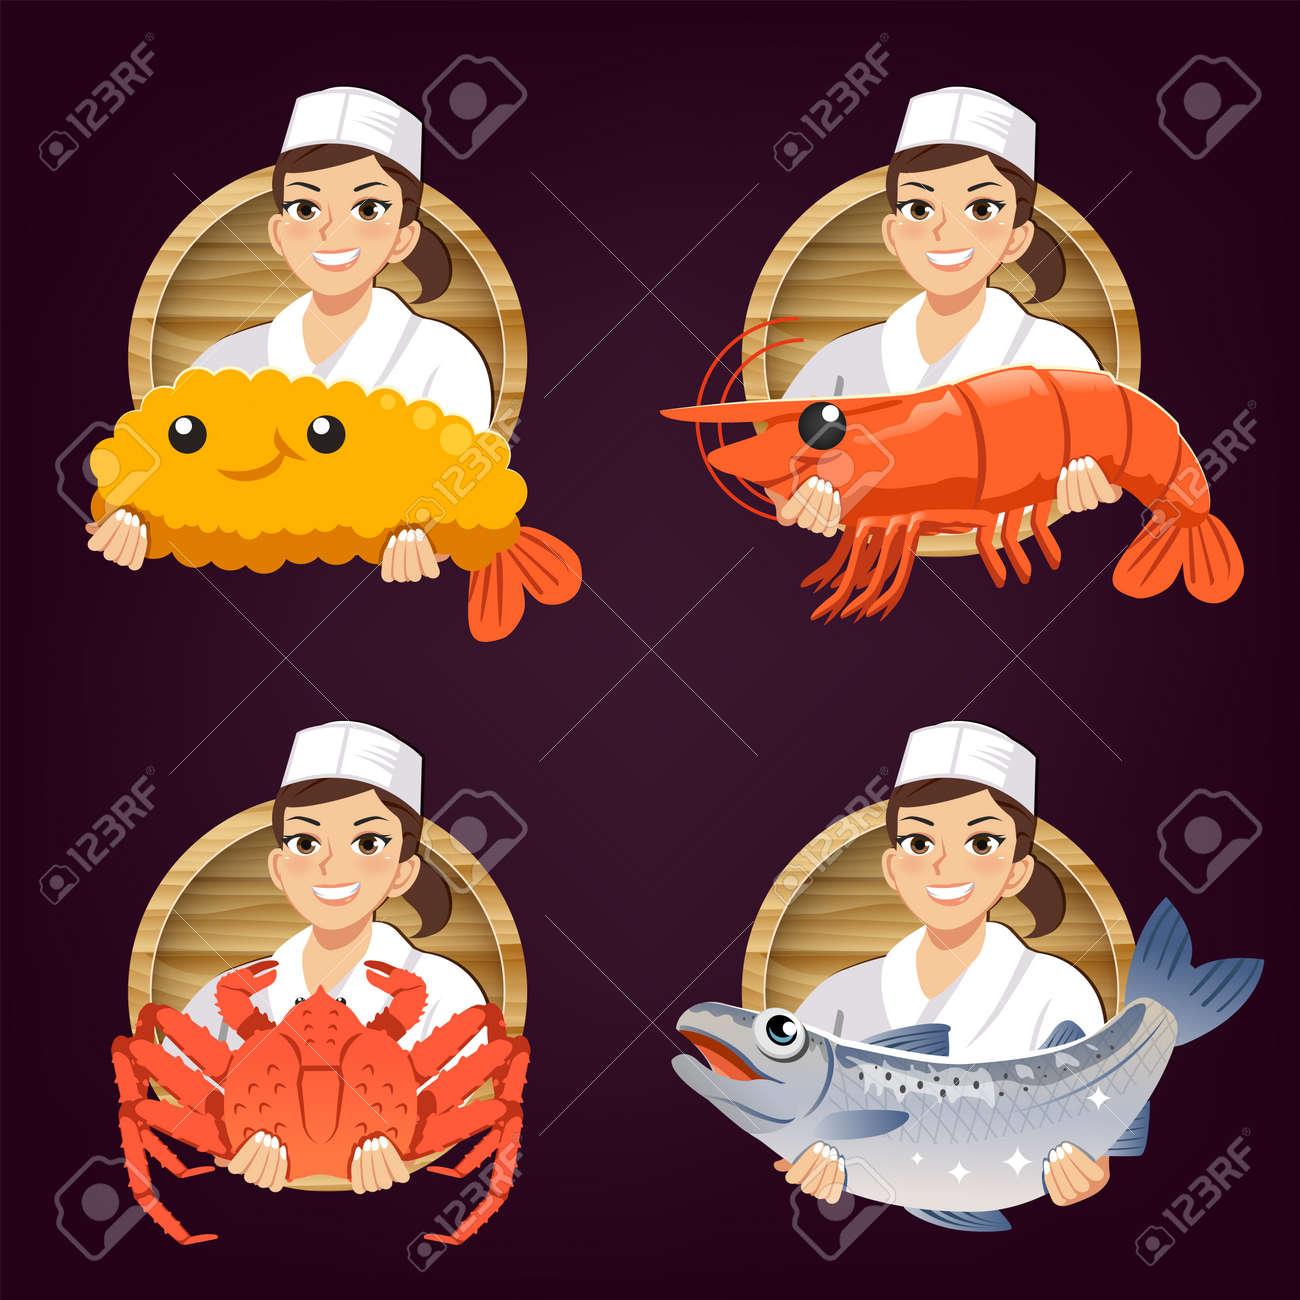 female japanese chef serve fresh ingredients. Seafood restaurant logo concept design. - 168924766